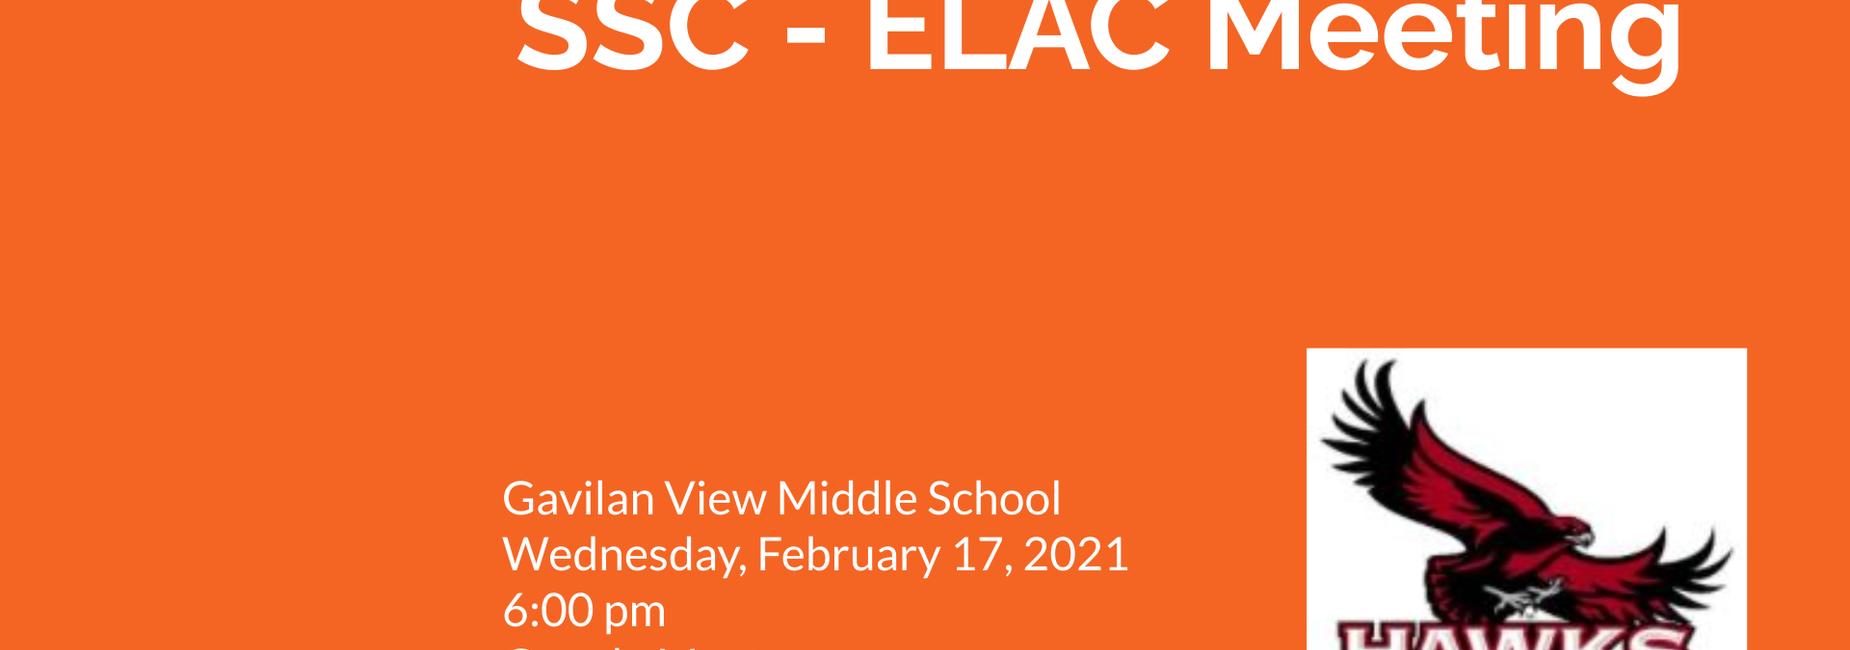 Gavilan View SSC - ELAC Meeting February 17 6pm